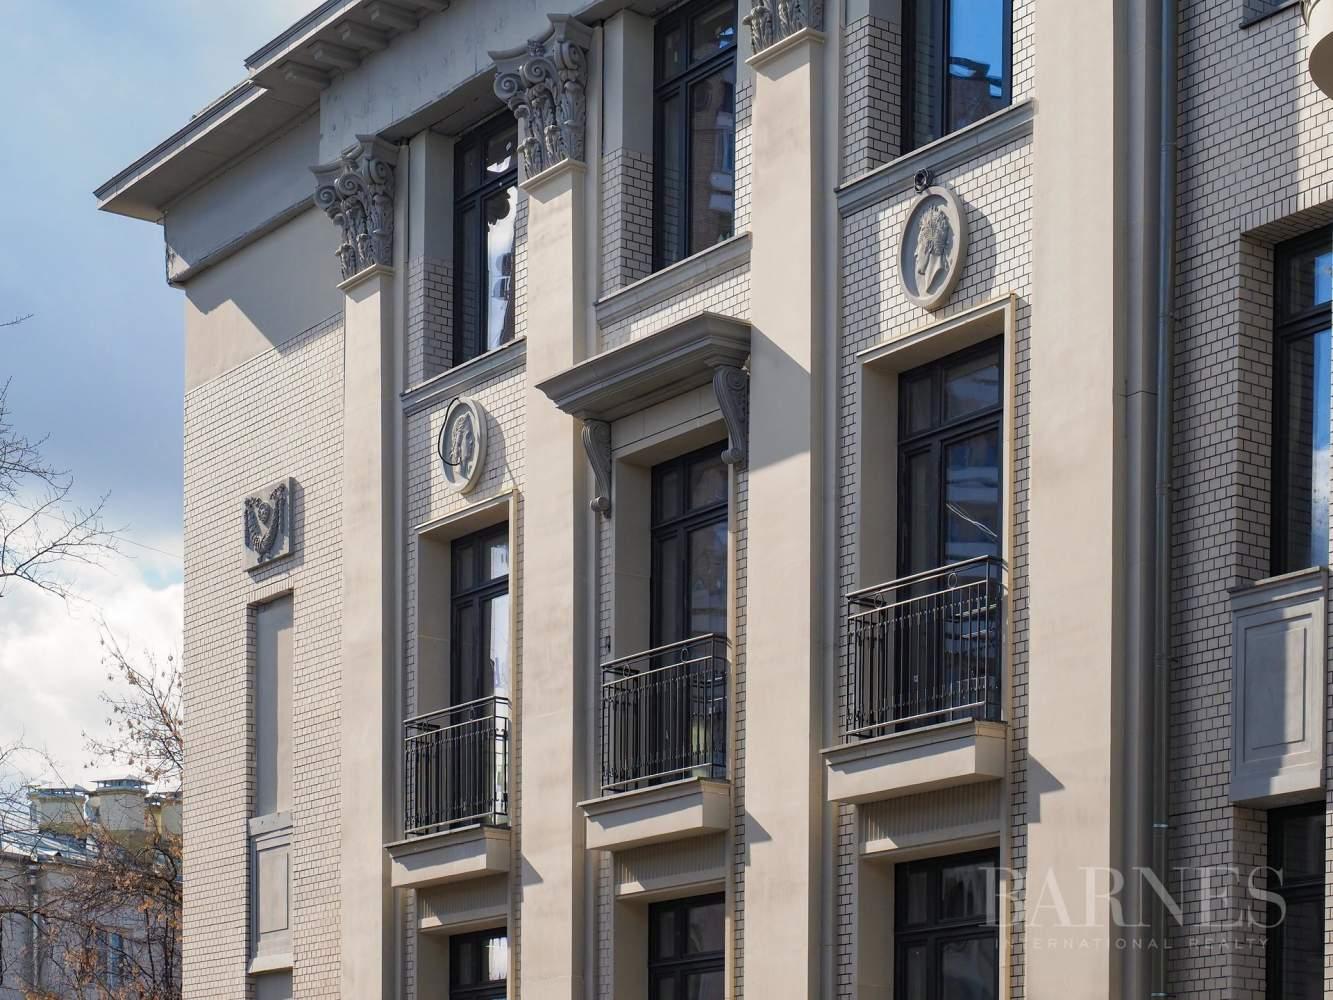 Moscow  - Квартира 2 Комнаты, 1 Спальня - picture 8